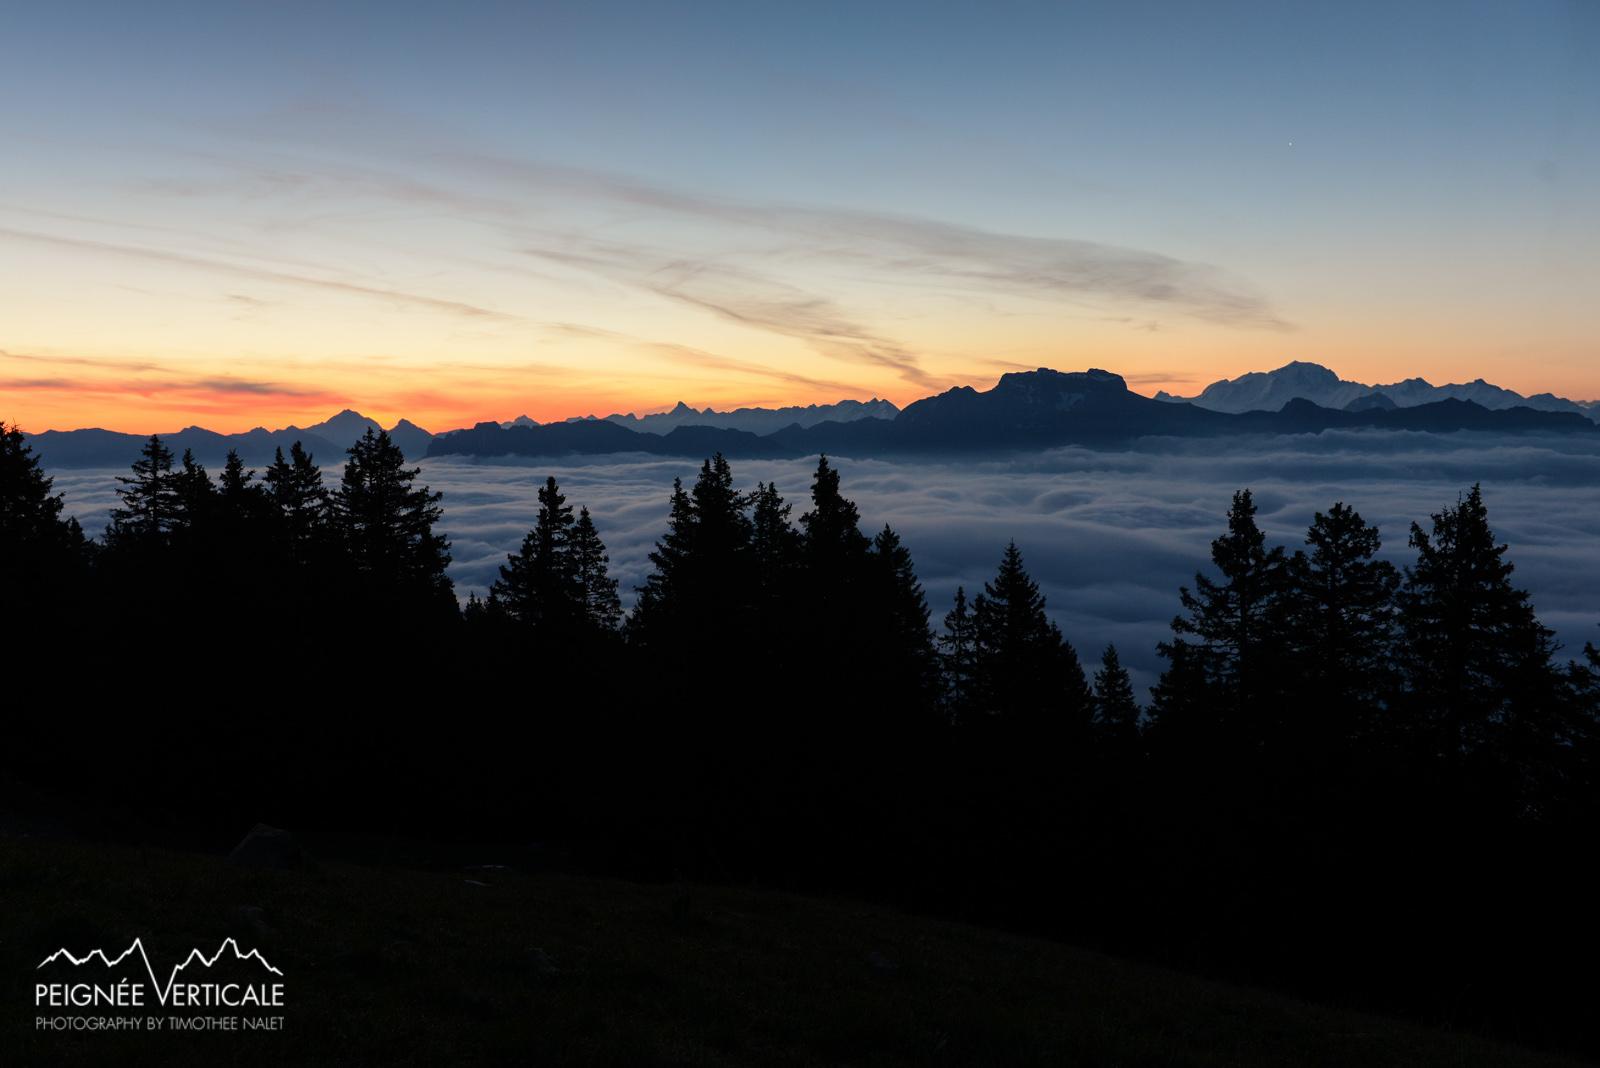 MaxiRace-Annecy-2014-Team-Hoka-Timothee-Nalet-0784.jpg